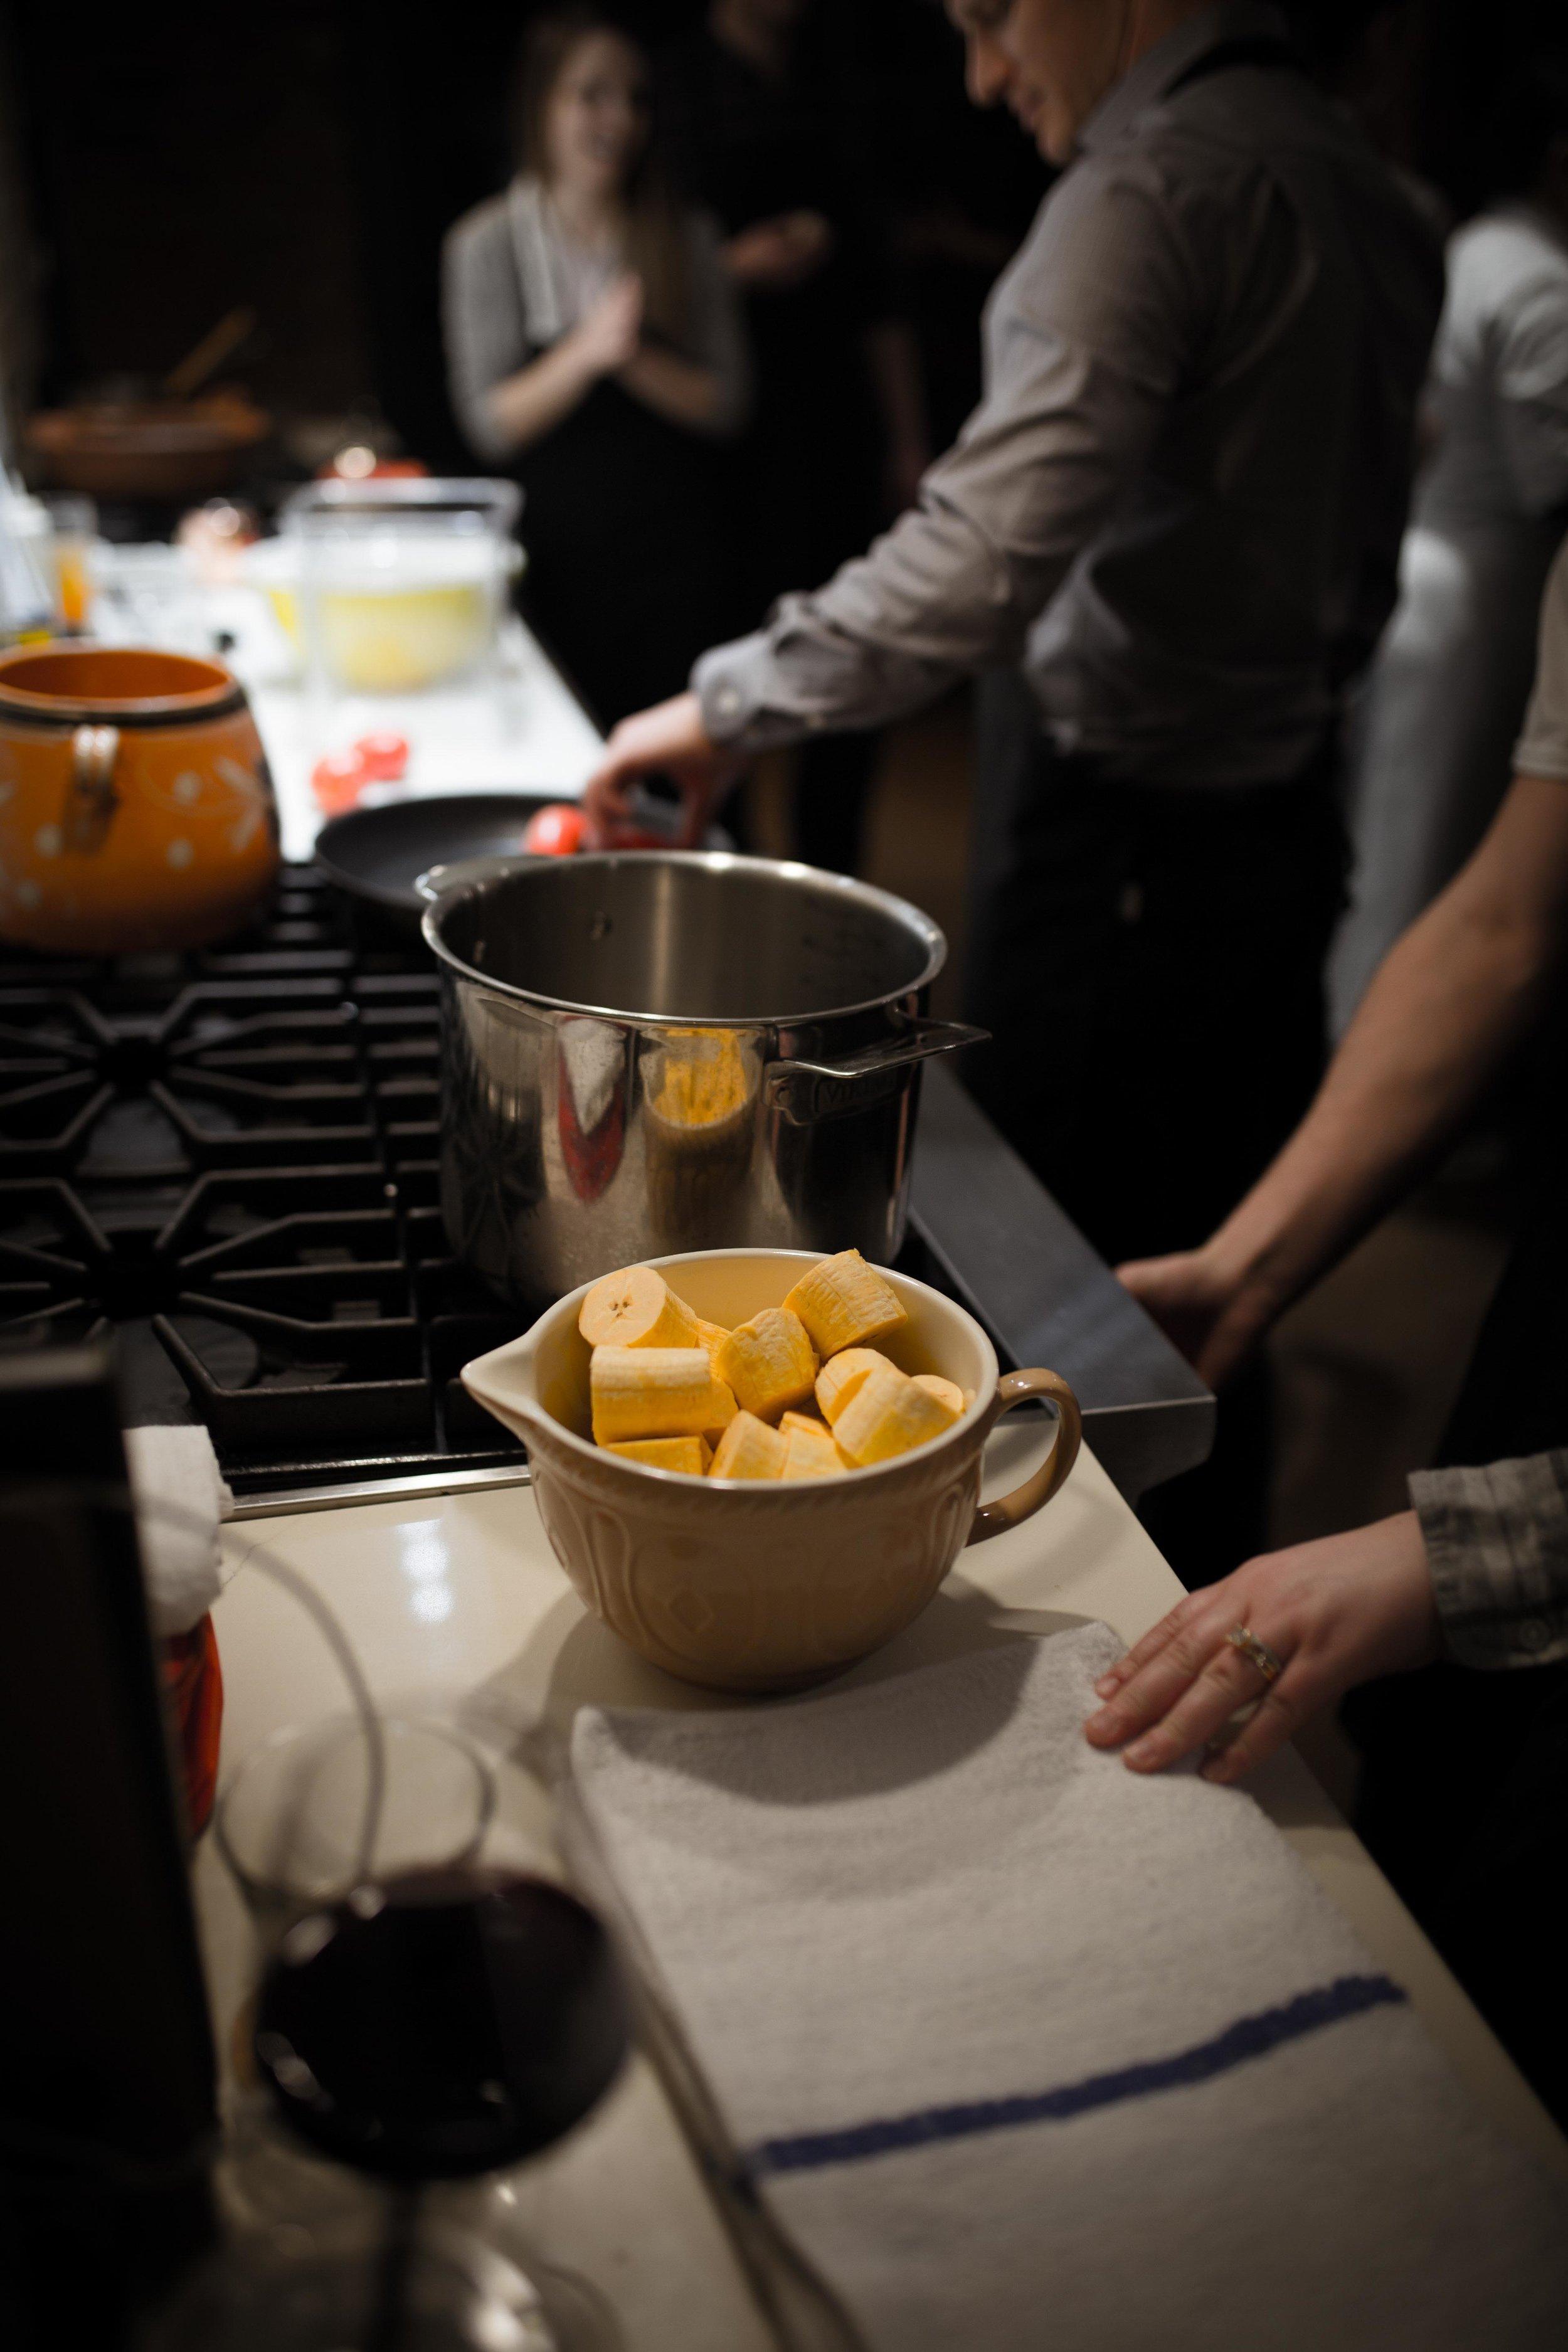 GingerandBaker-JuliyJuan-CookingClass-Feb28-44.jpg